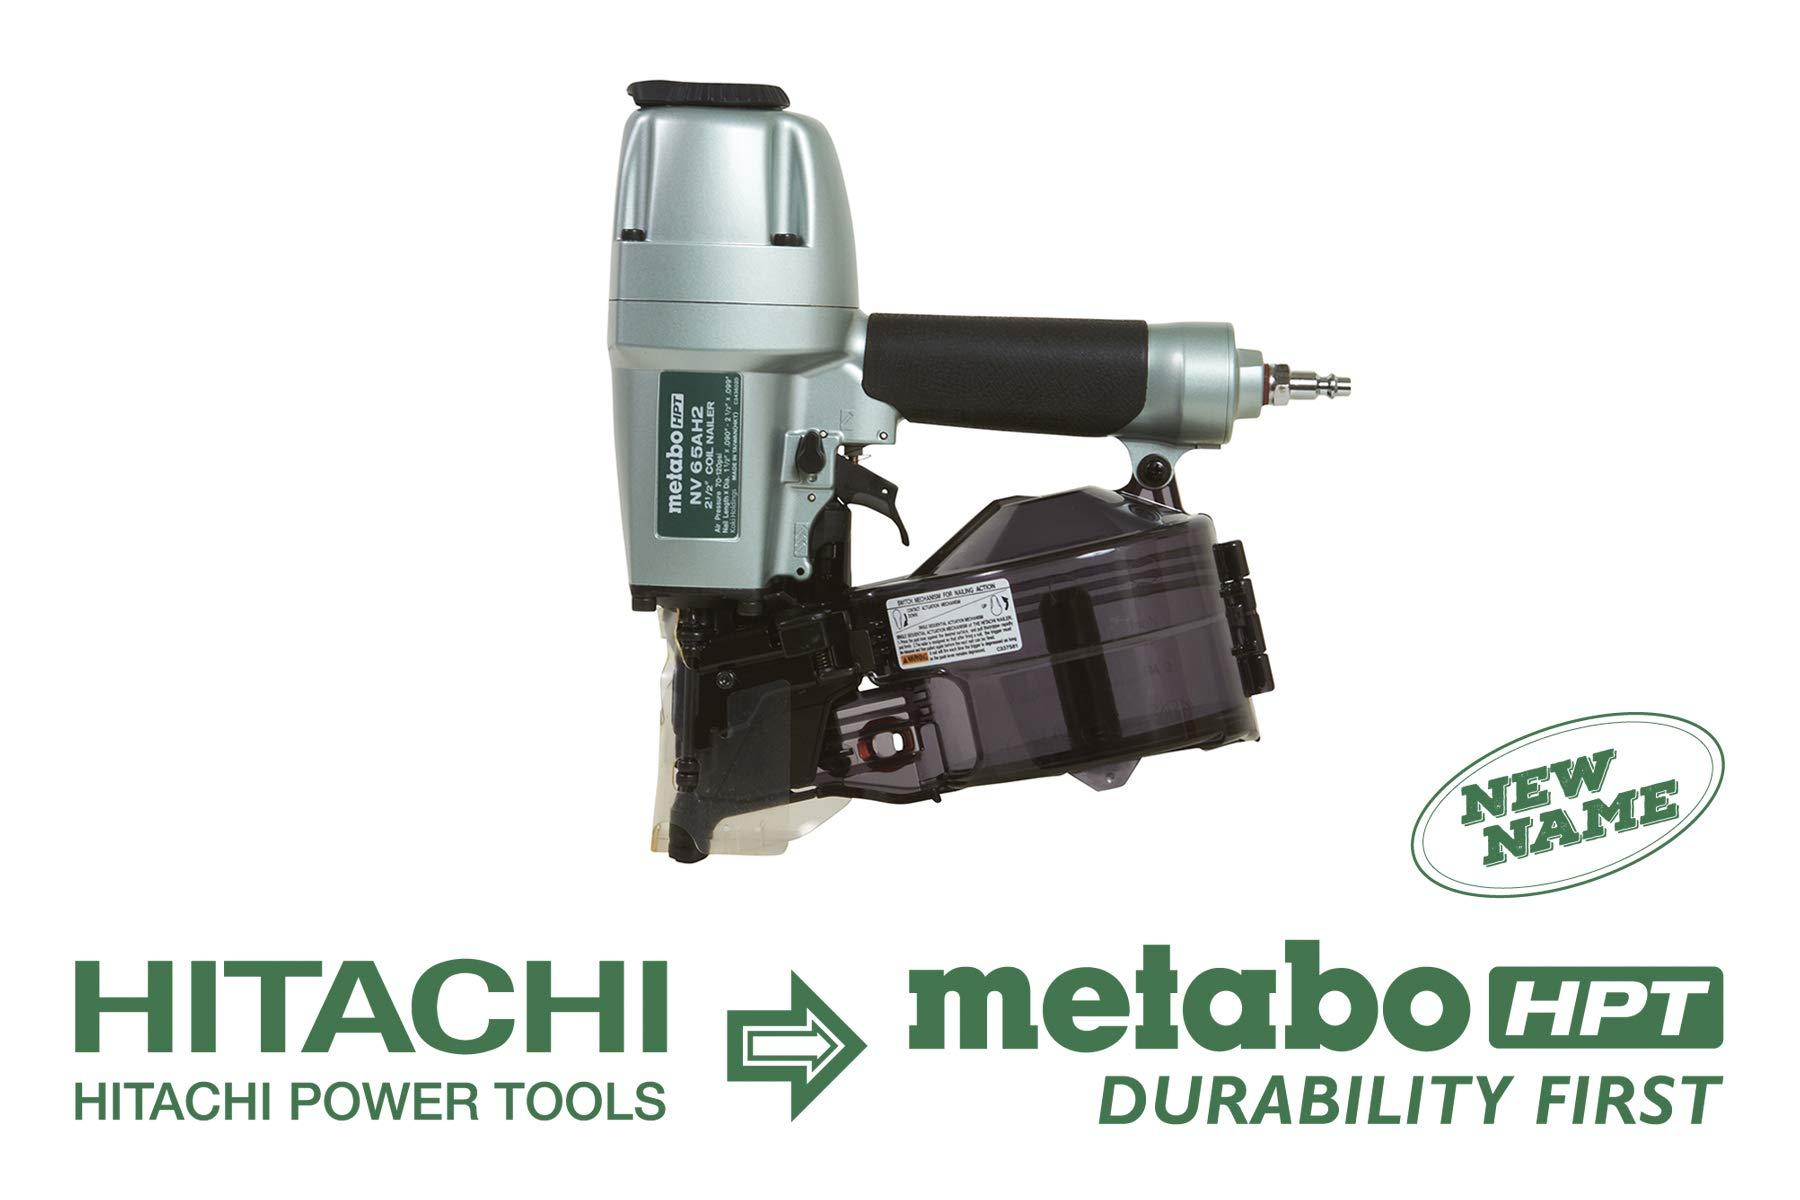 Metabo HPT NV65AH2 Collation Warranty